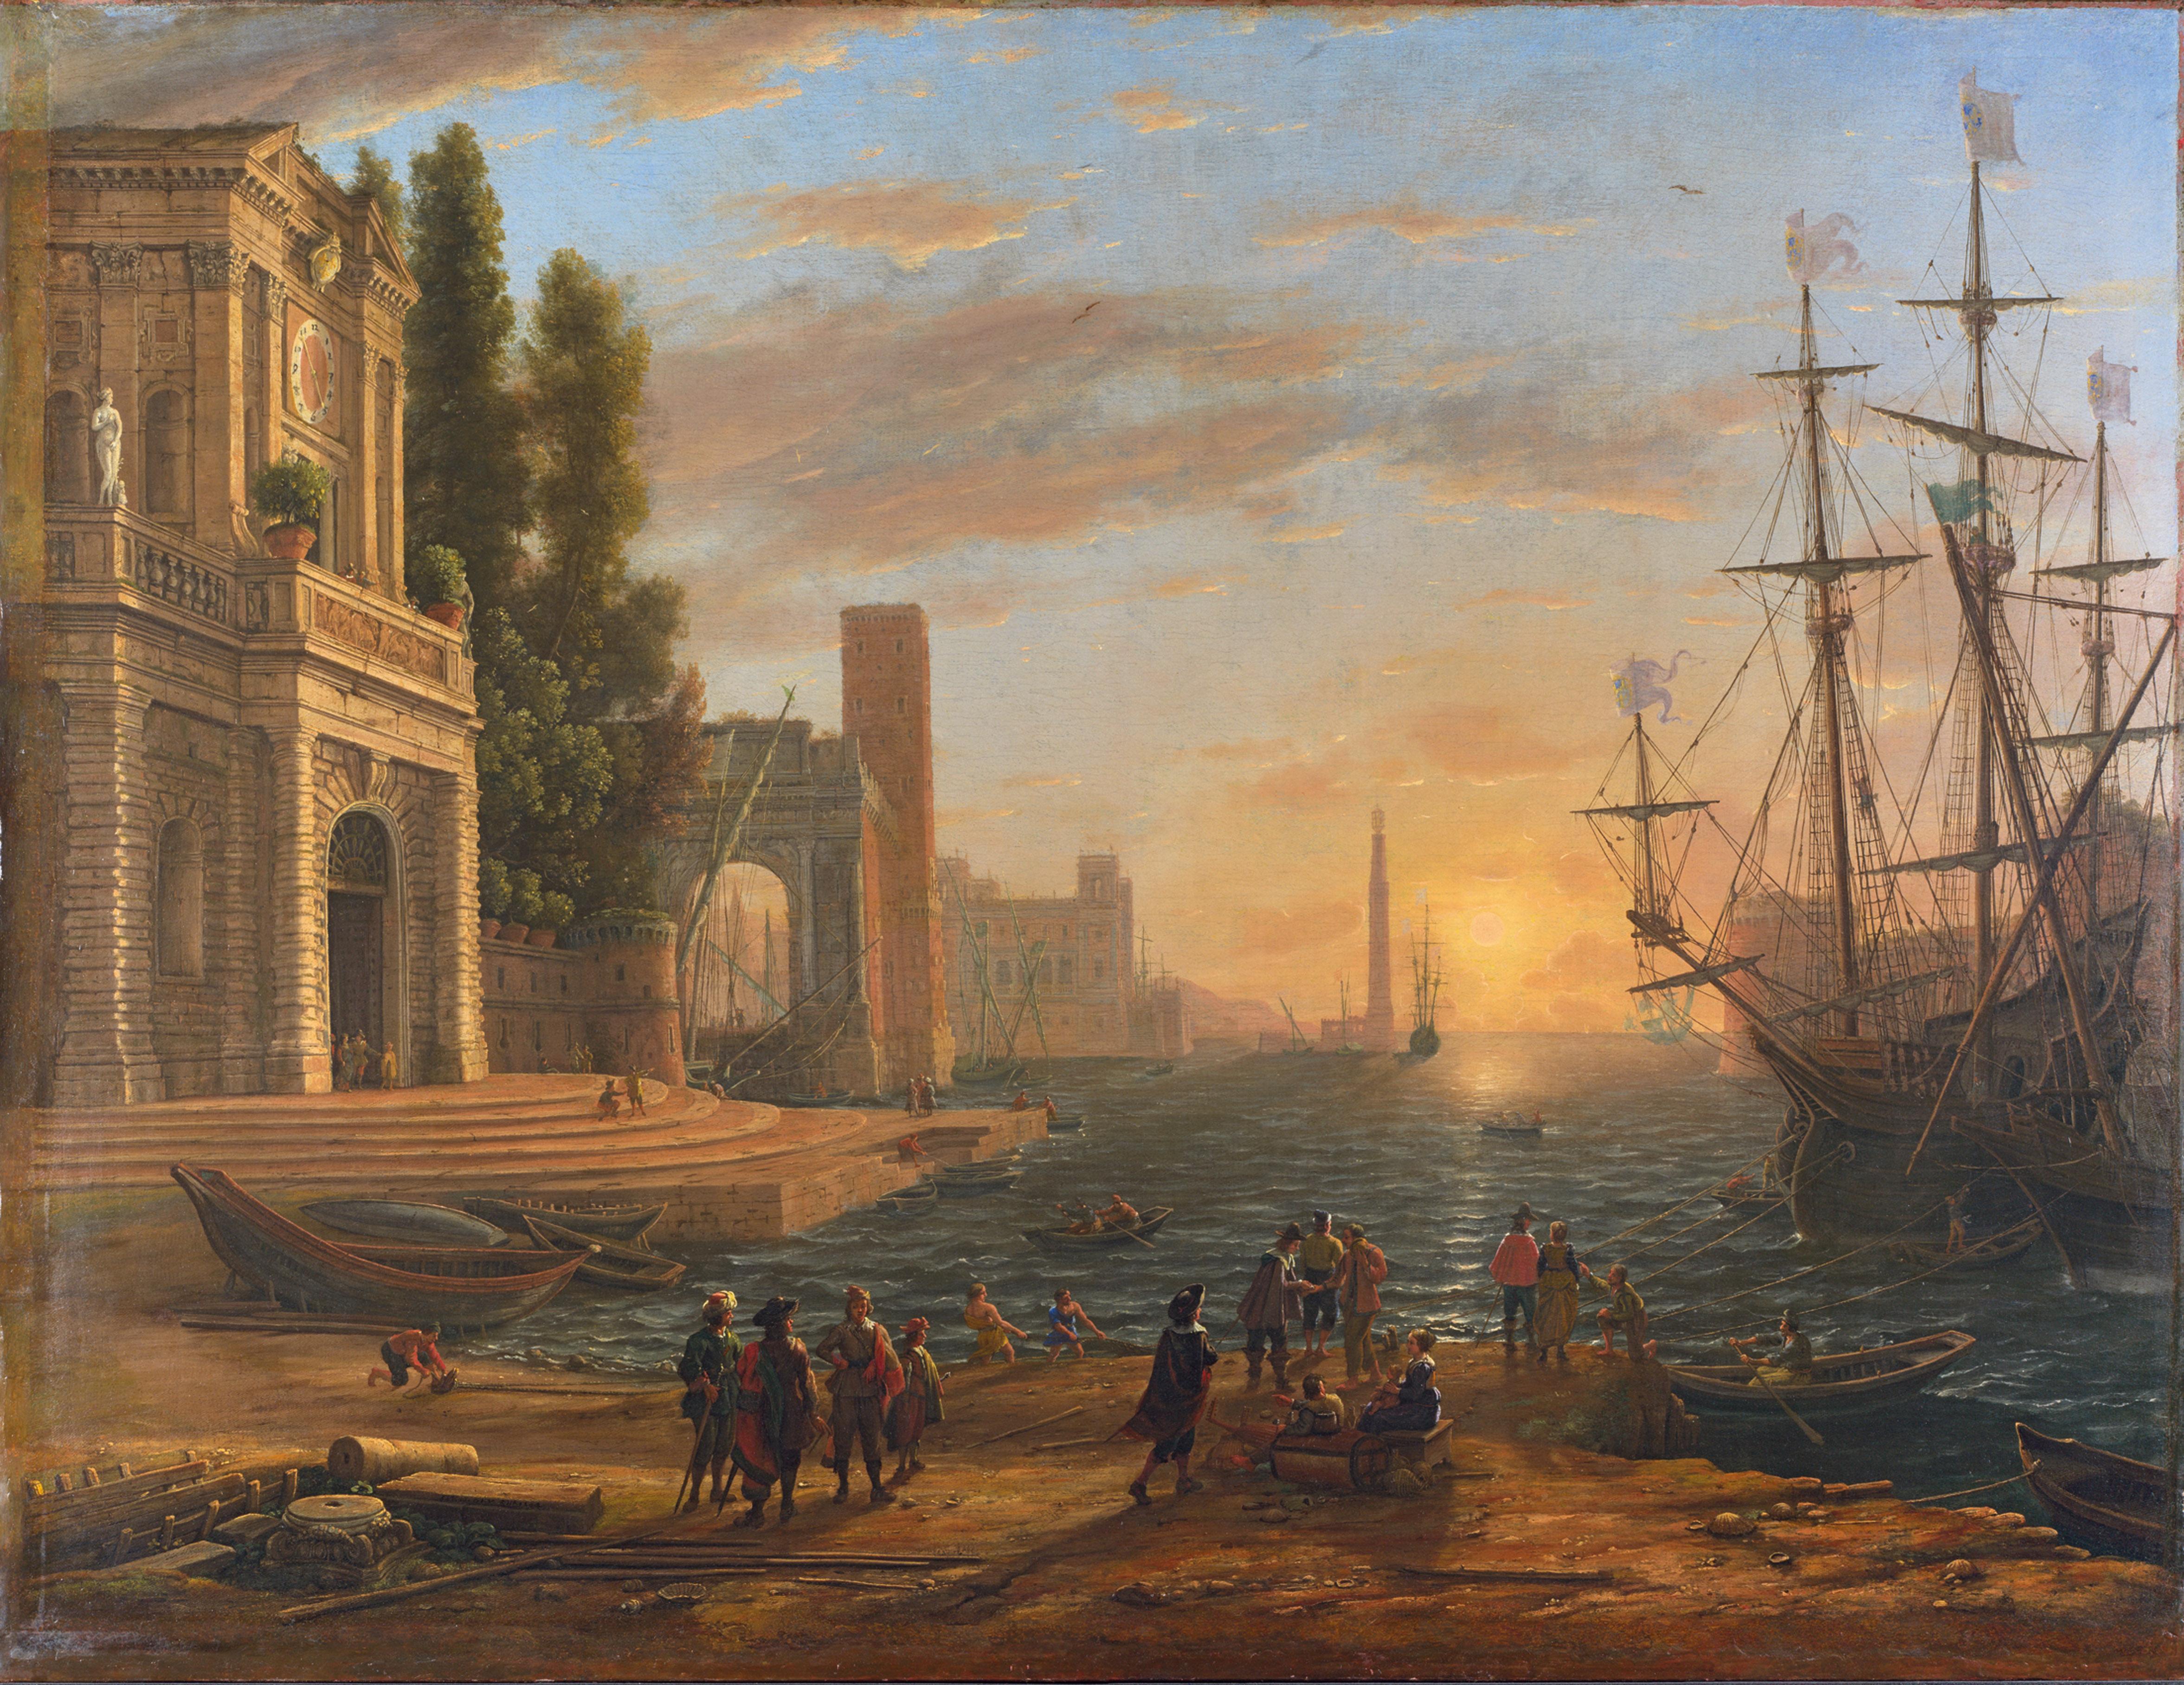 Landschaftsmalerei renaissance  Claude Lorrain – Die verzauberte Landschaft » DANDY-CLUB